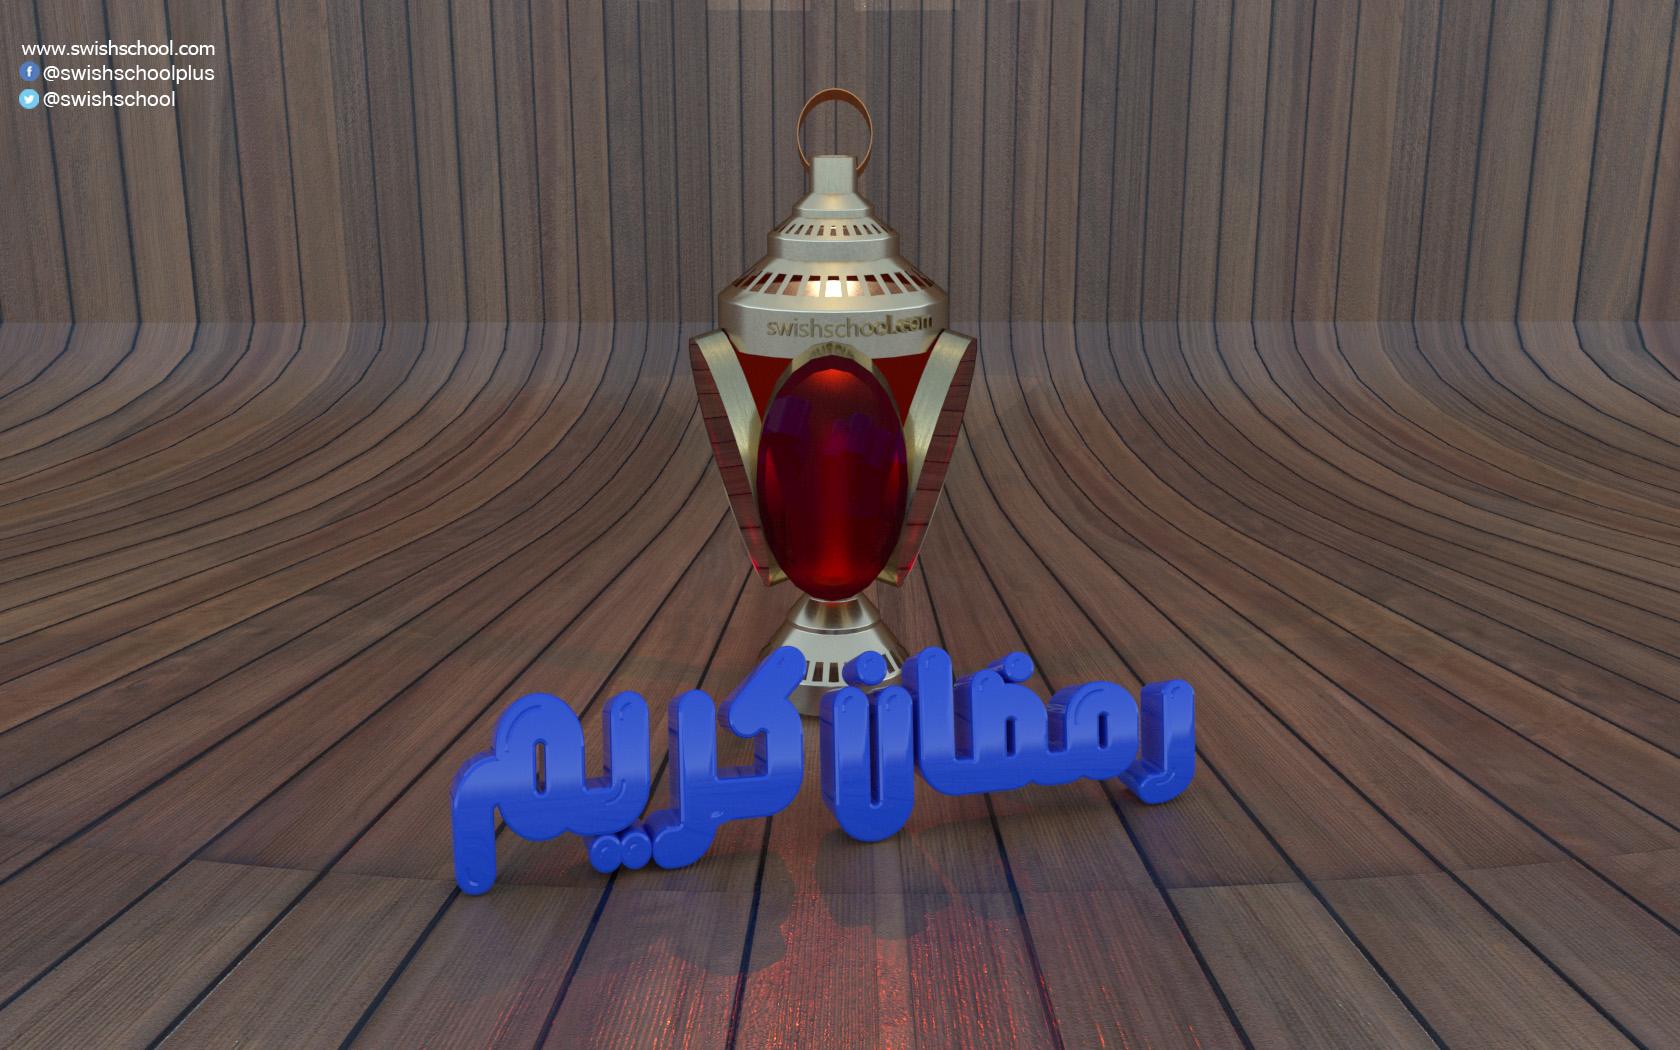 3D فانوس رمضان 2 فانوس رمضان 3D سينما فور دي